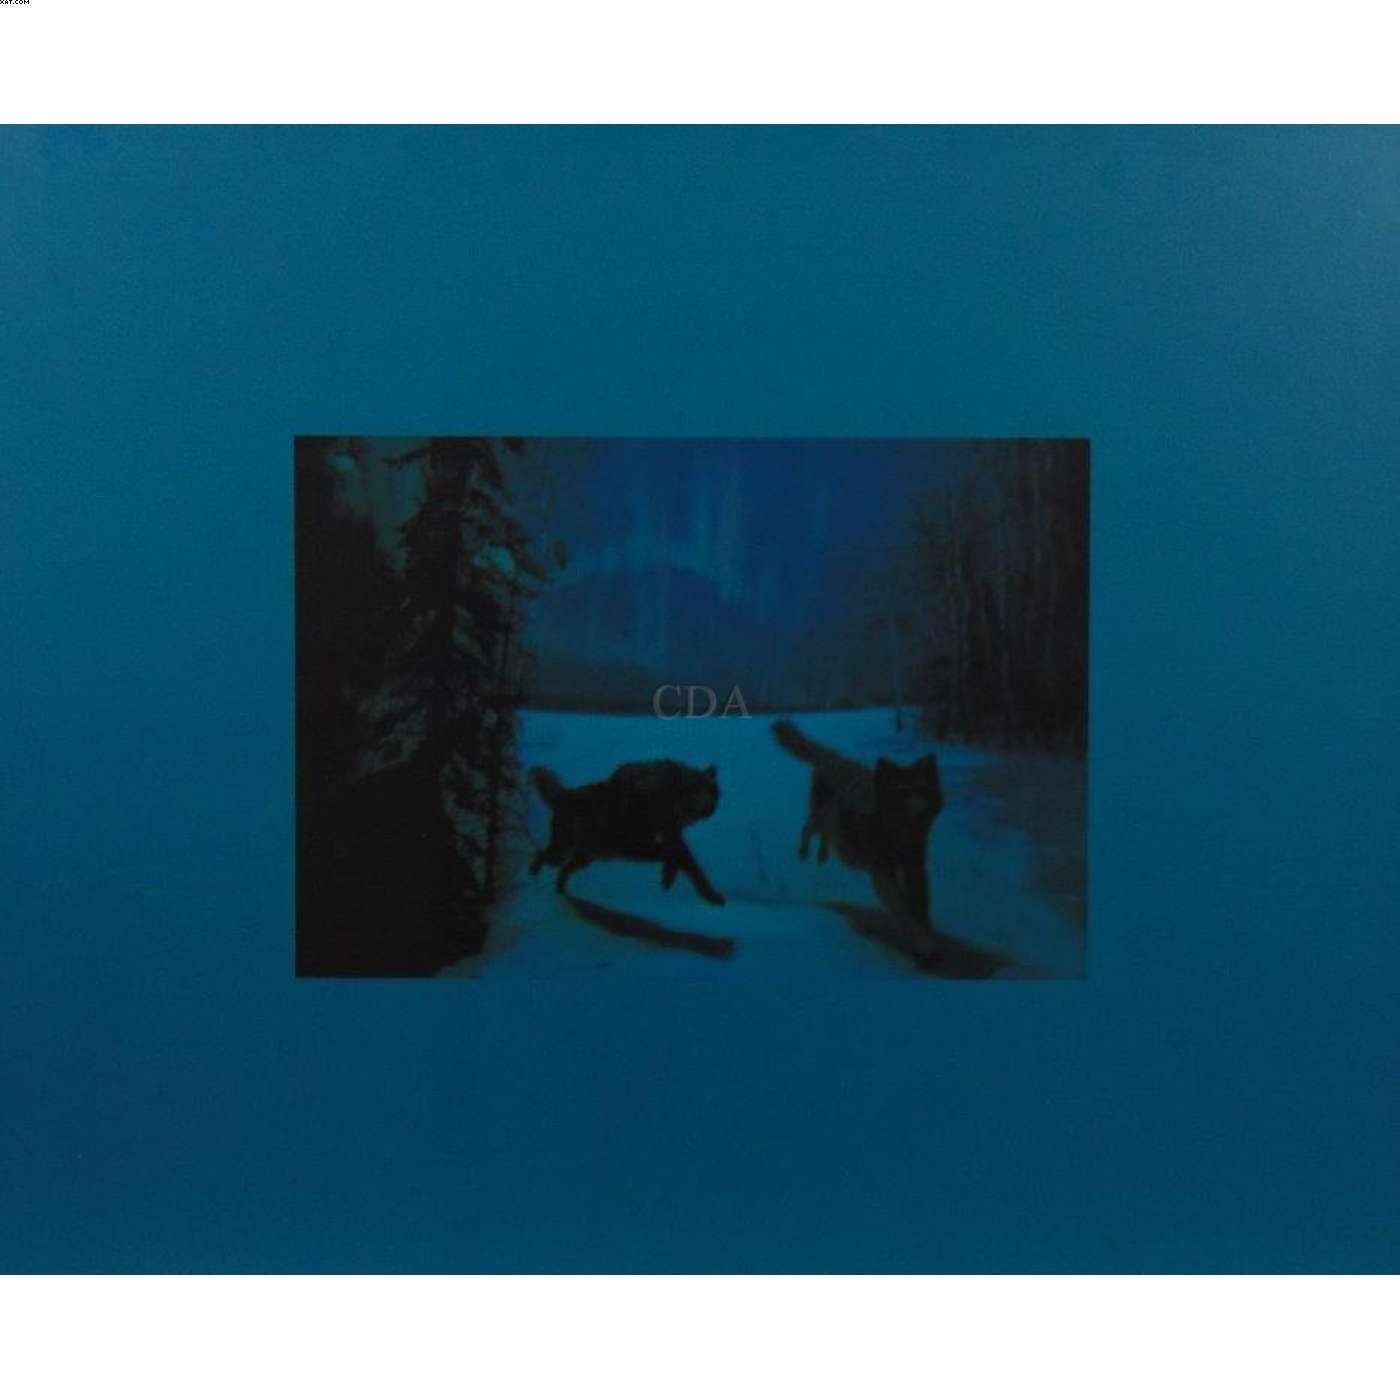 Azul Petróleo - Albano Afonso